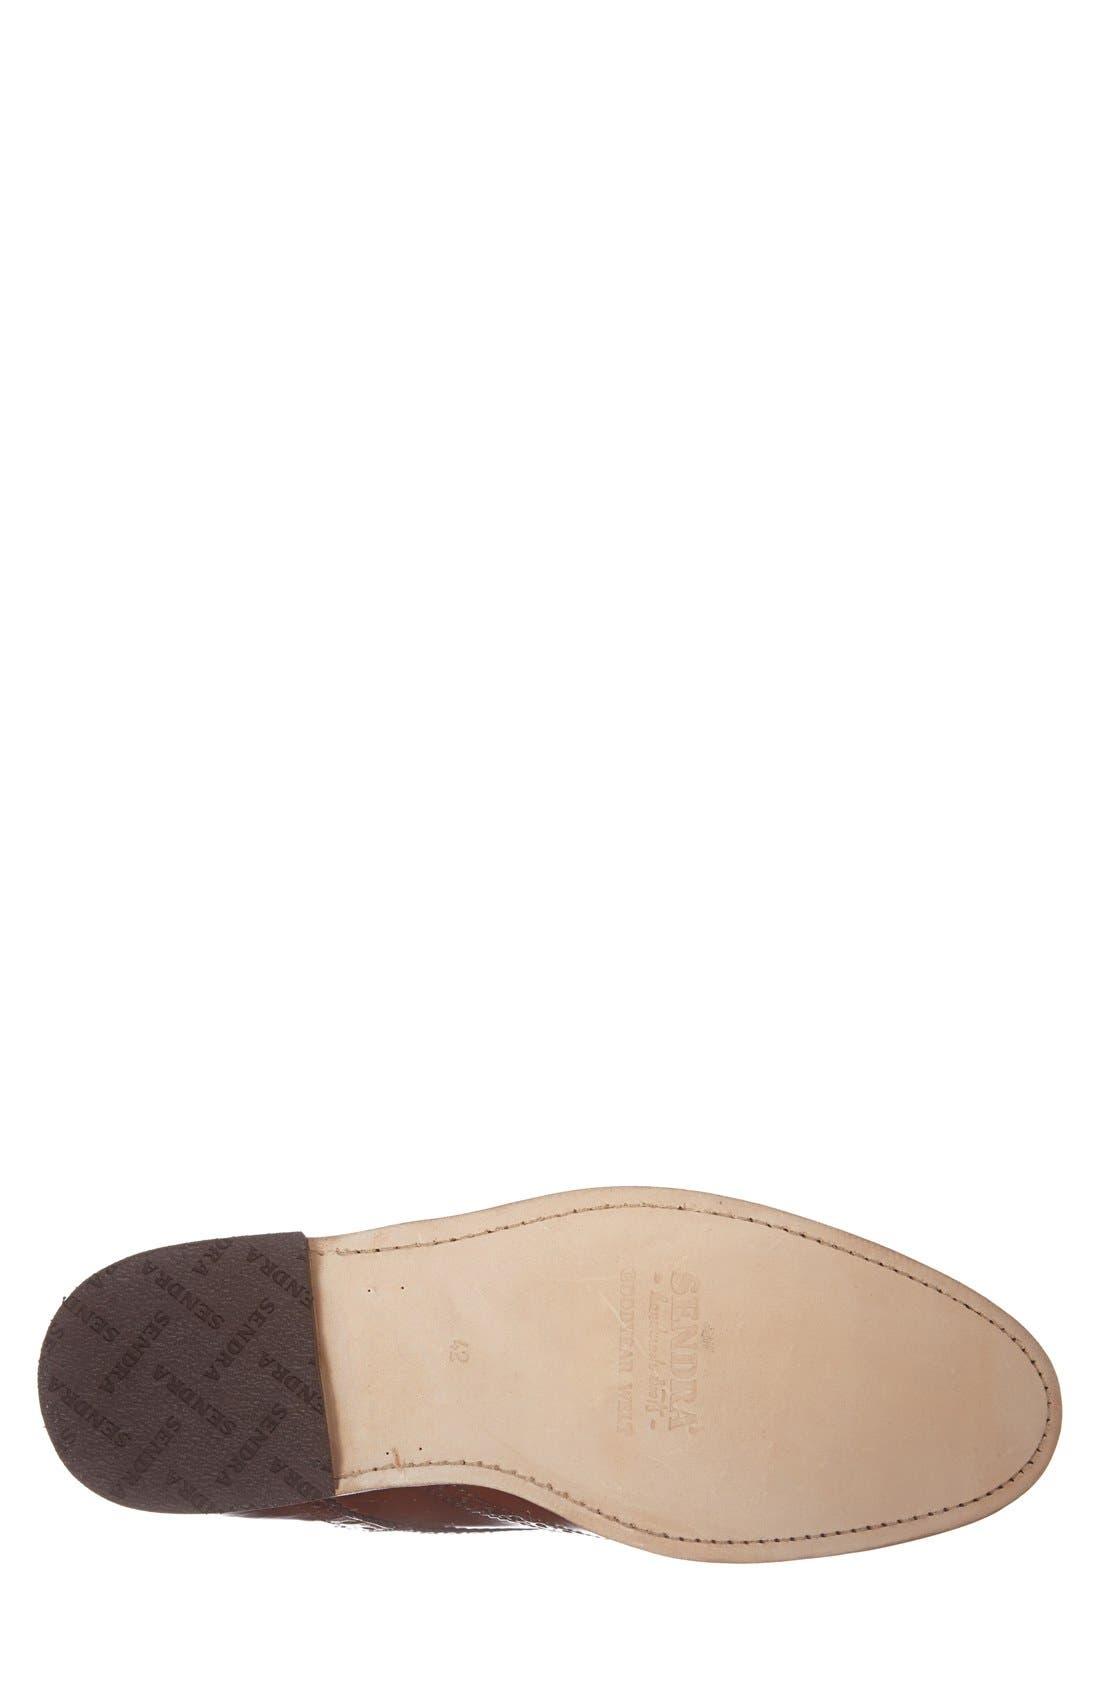 'Newport' Wingtip Boot,                             Alternate thumbnail 4, color,                             Cognac